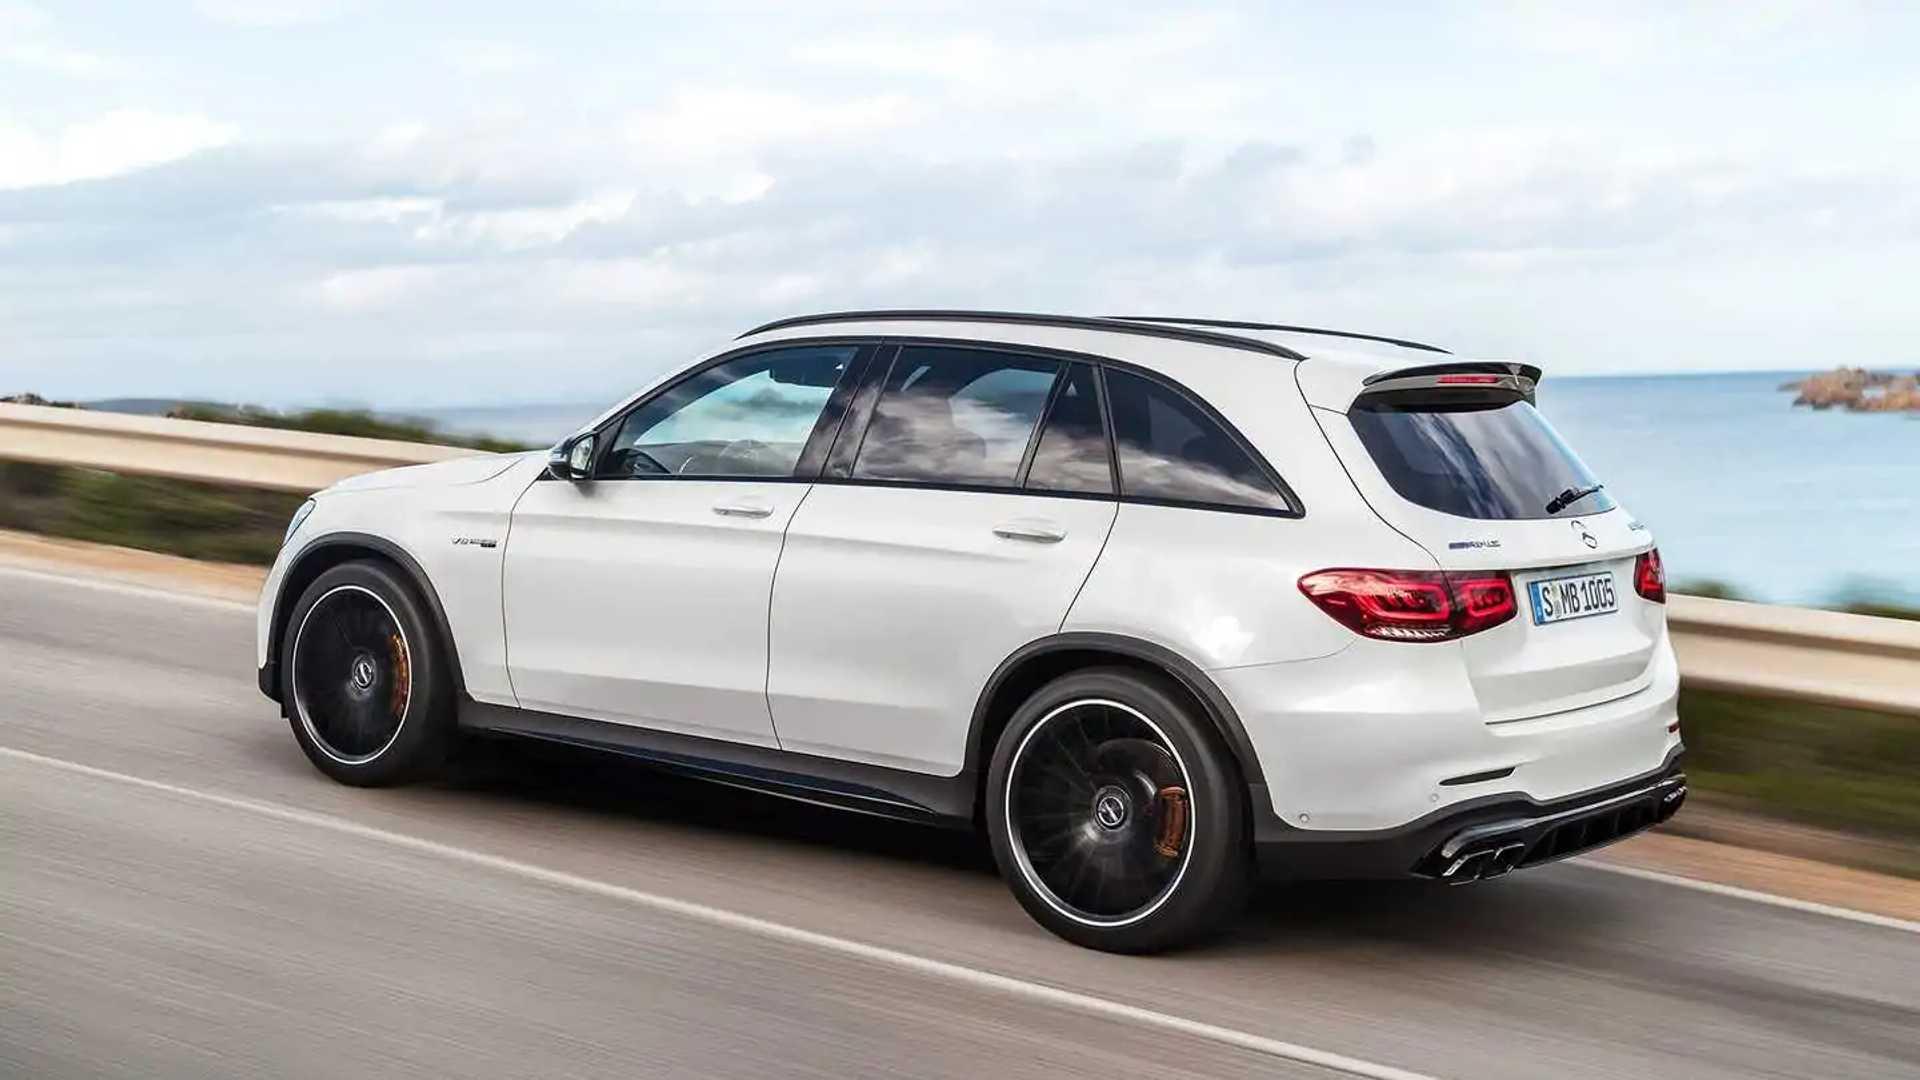 Mercedes-AMG представил мощные версии GLC 63 и GLC 63 Coupe